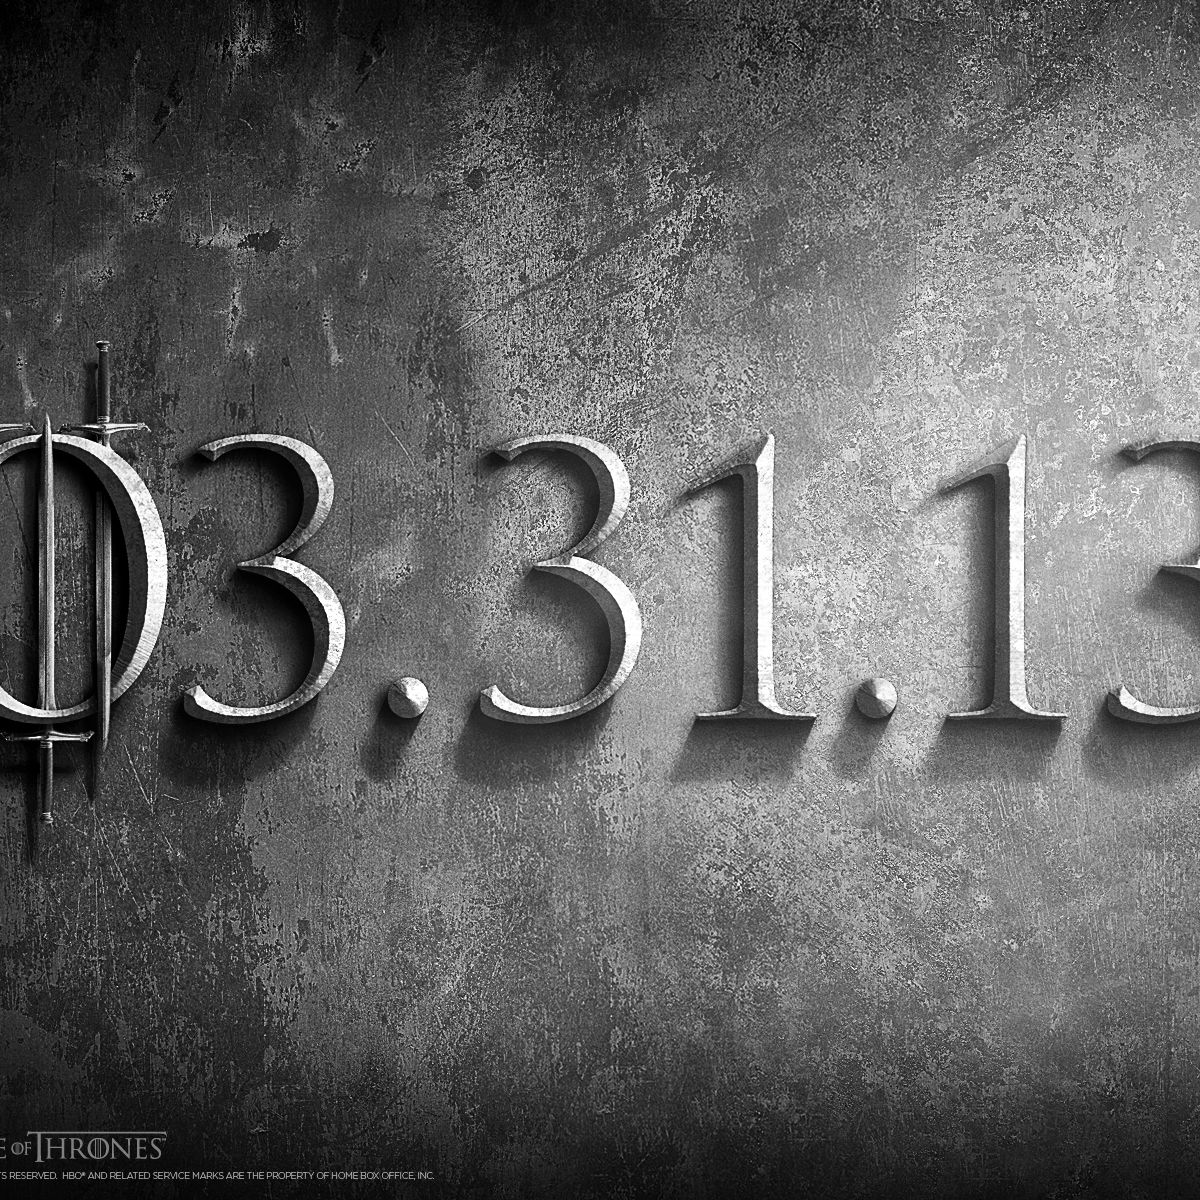 game-of-thrones-season-3-teaser.jpg